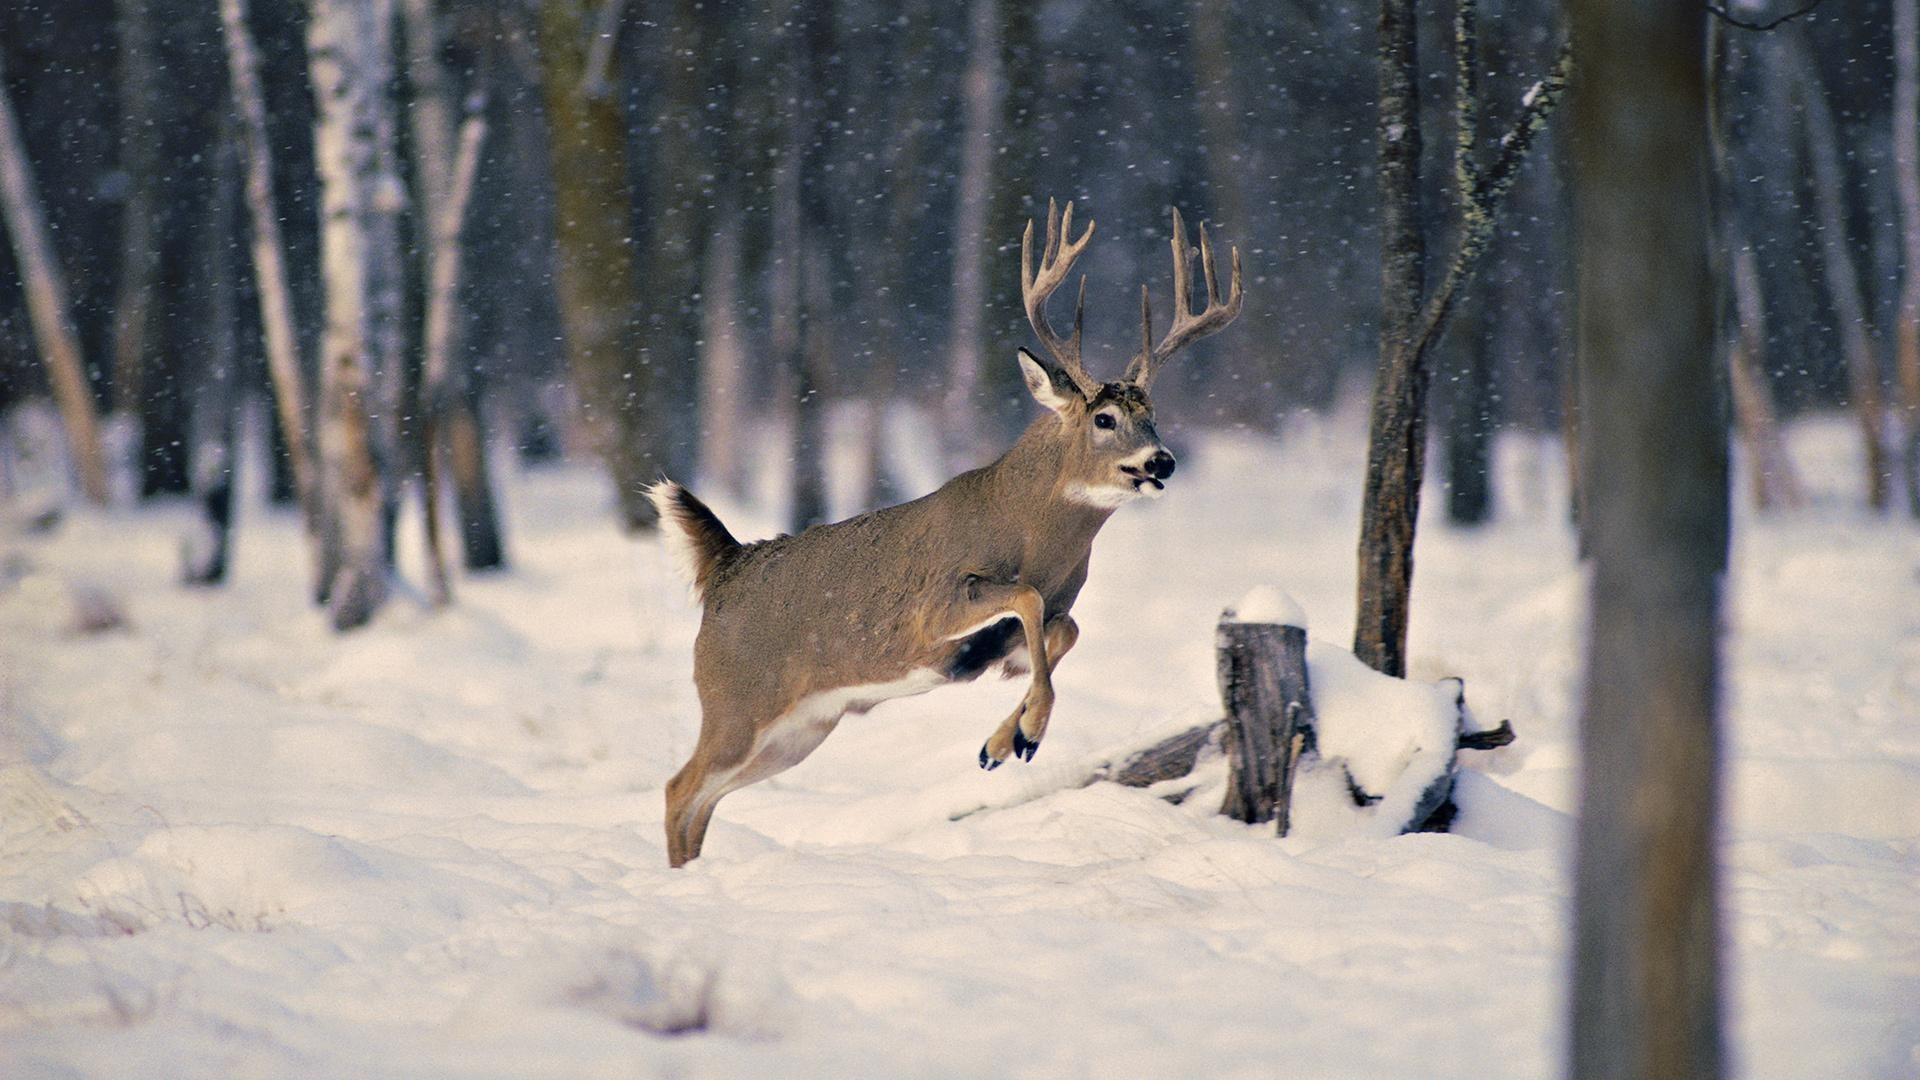 43 Whitetail Deer Wallpaper Screensaver